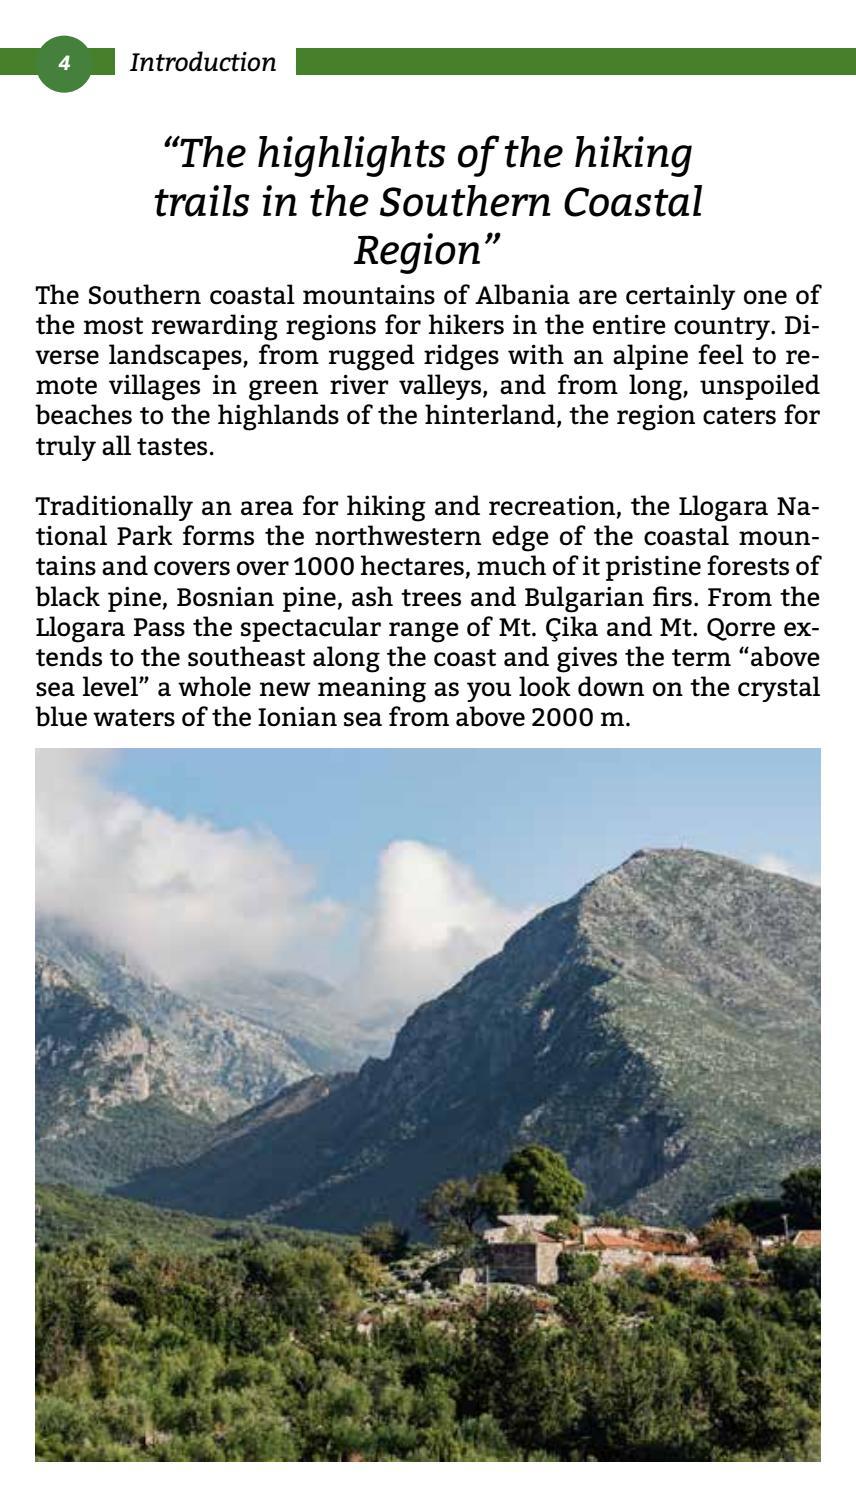 Hiking Trails in Himara Region page 4